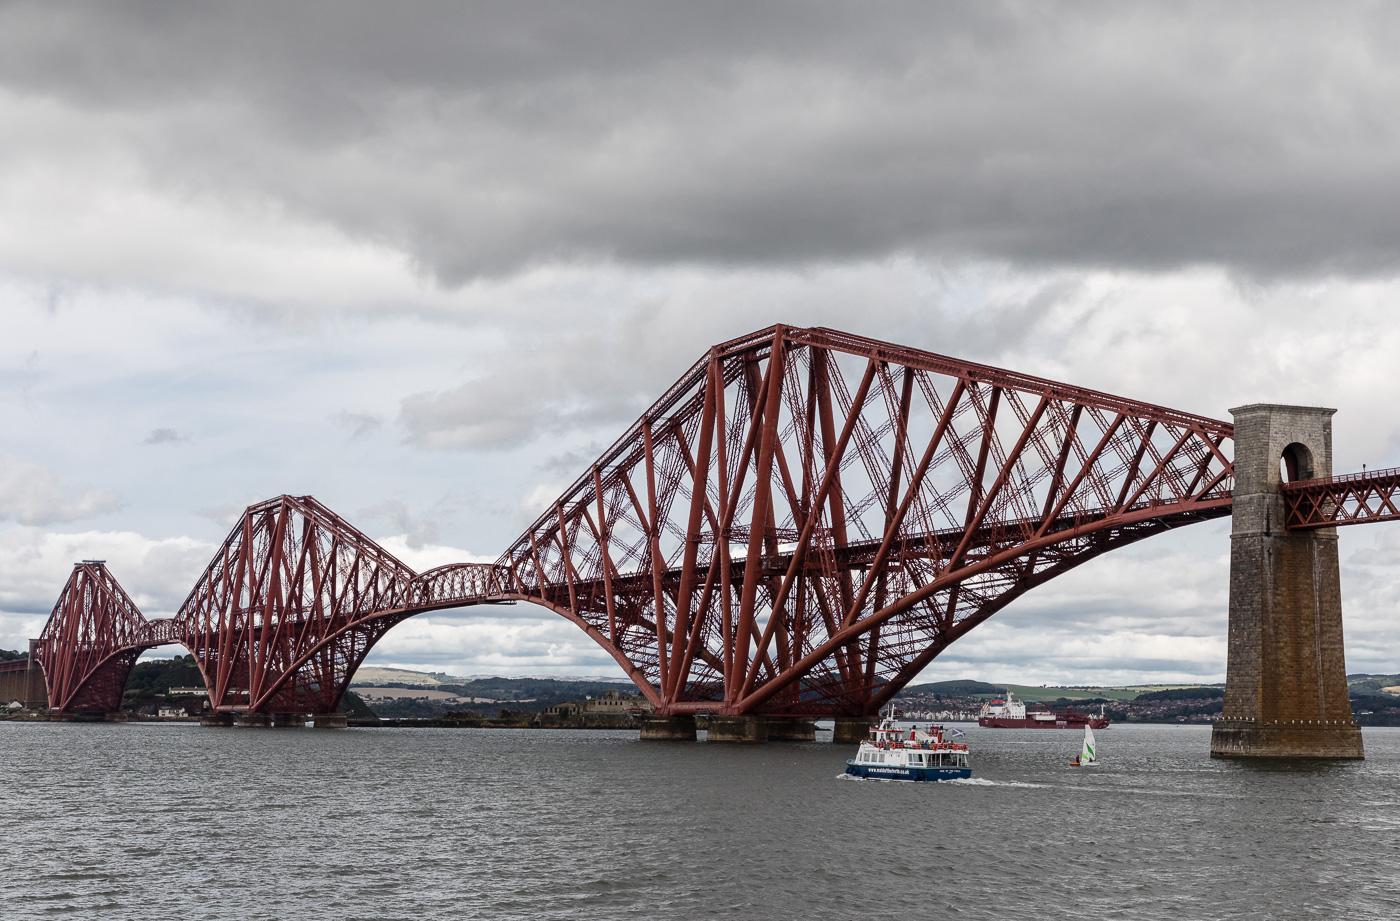 Cantilevered Railway Bridge